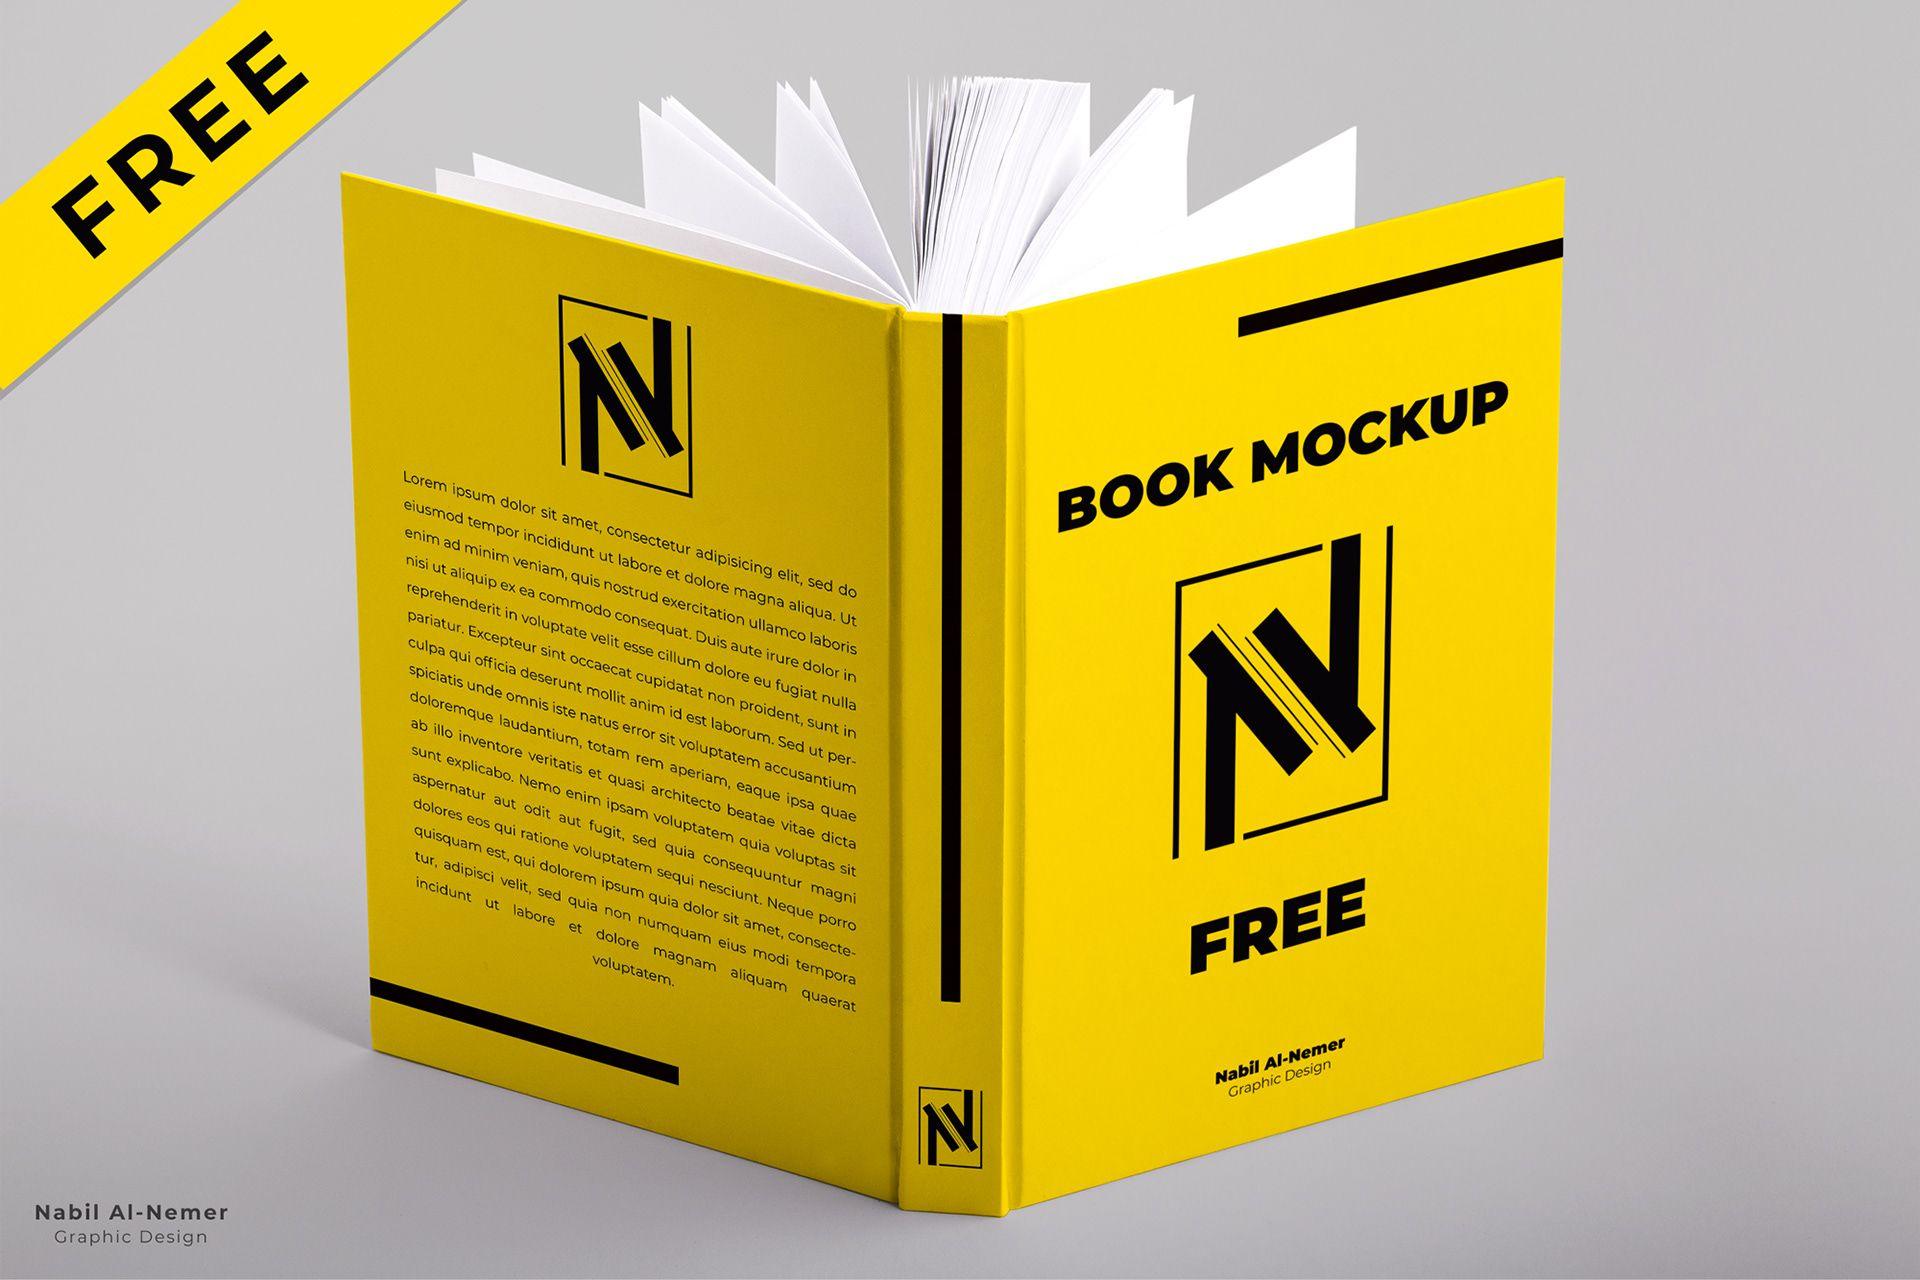 Free Open Book Hardcover Mockup Freebies Fribly Book Cover Mockup Mockup Template Free Open Book